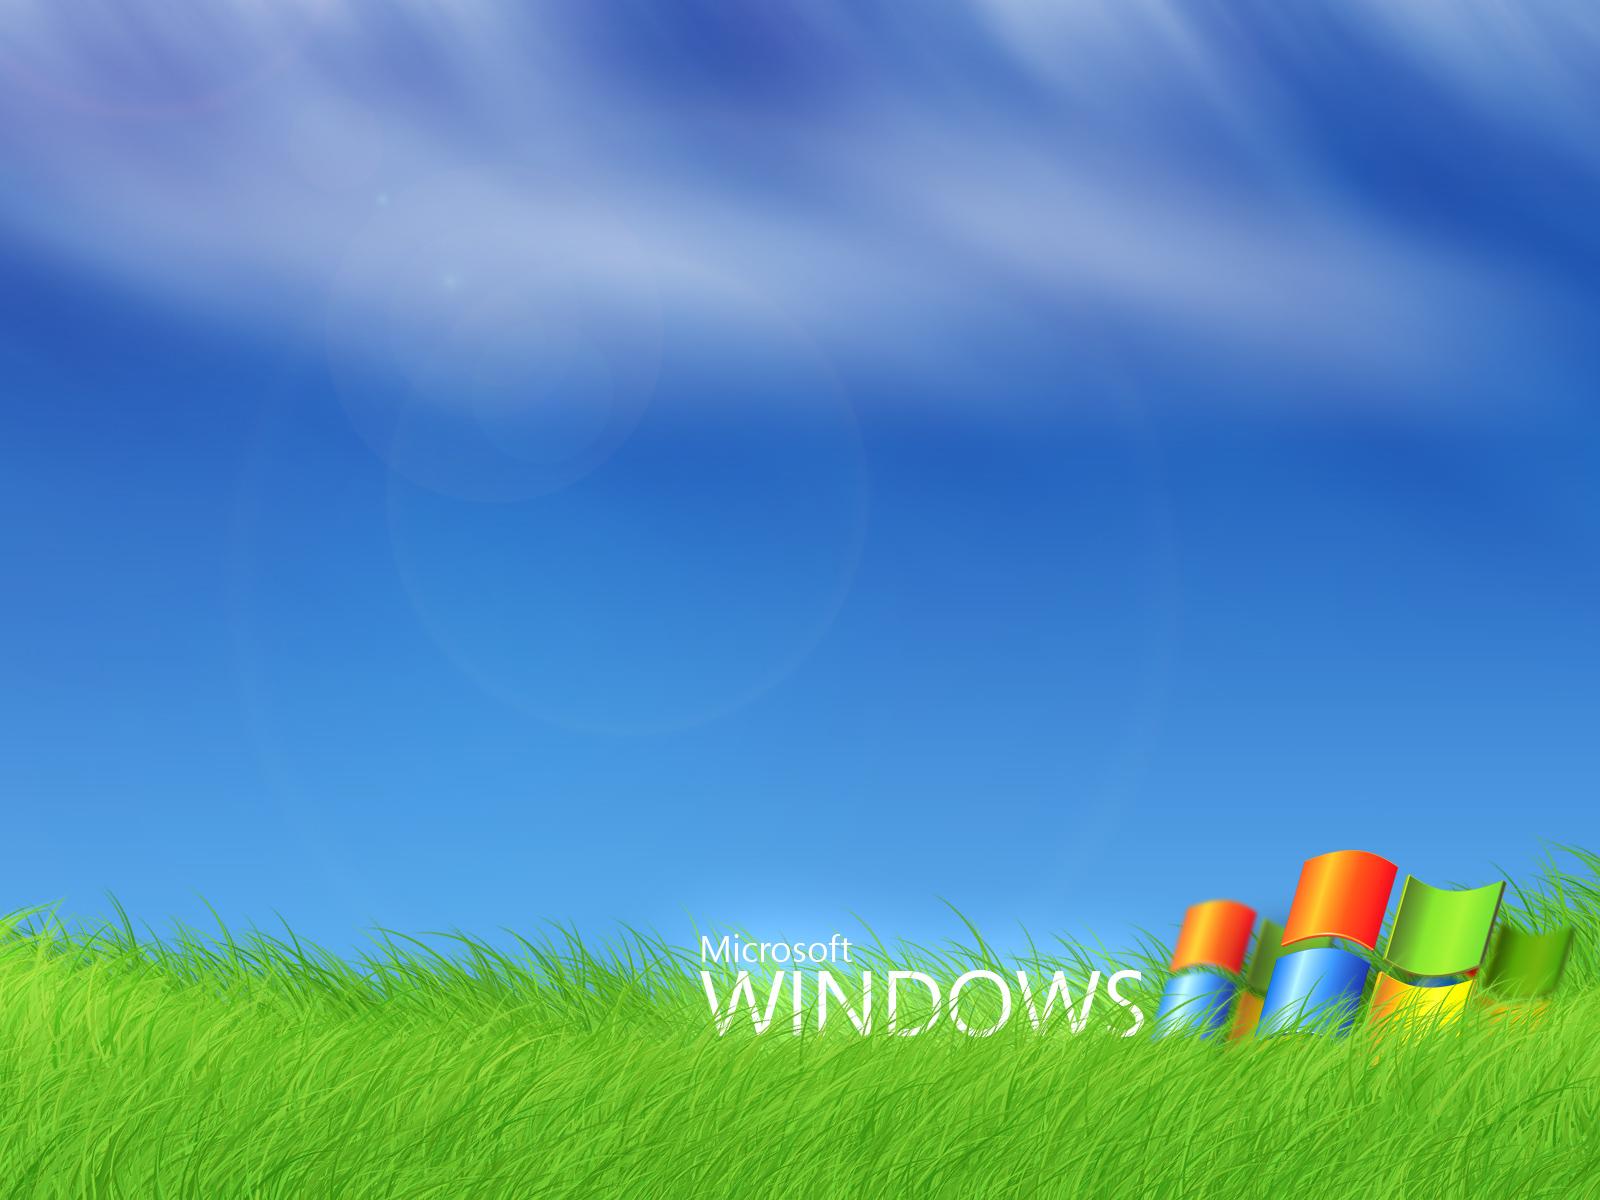 Microsoft Windows Wallpapers HD Wallpapers 1600x1200